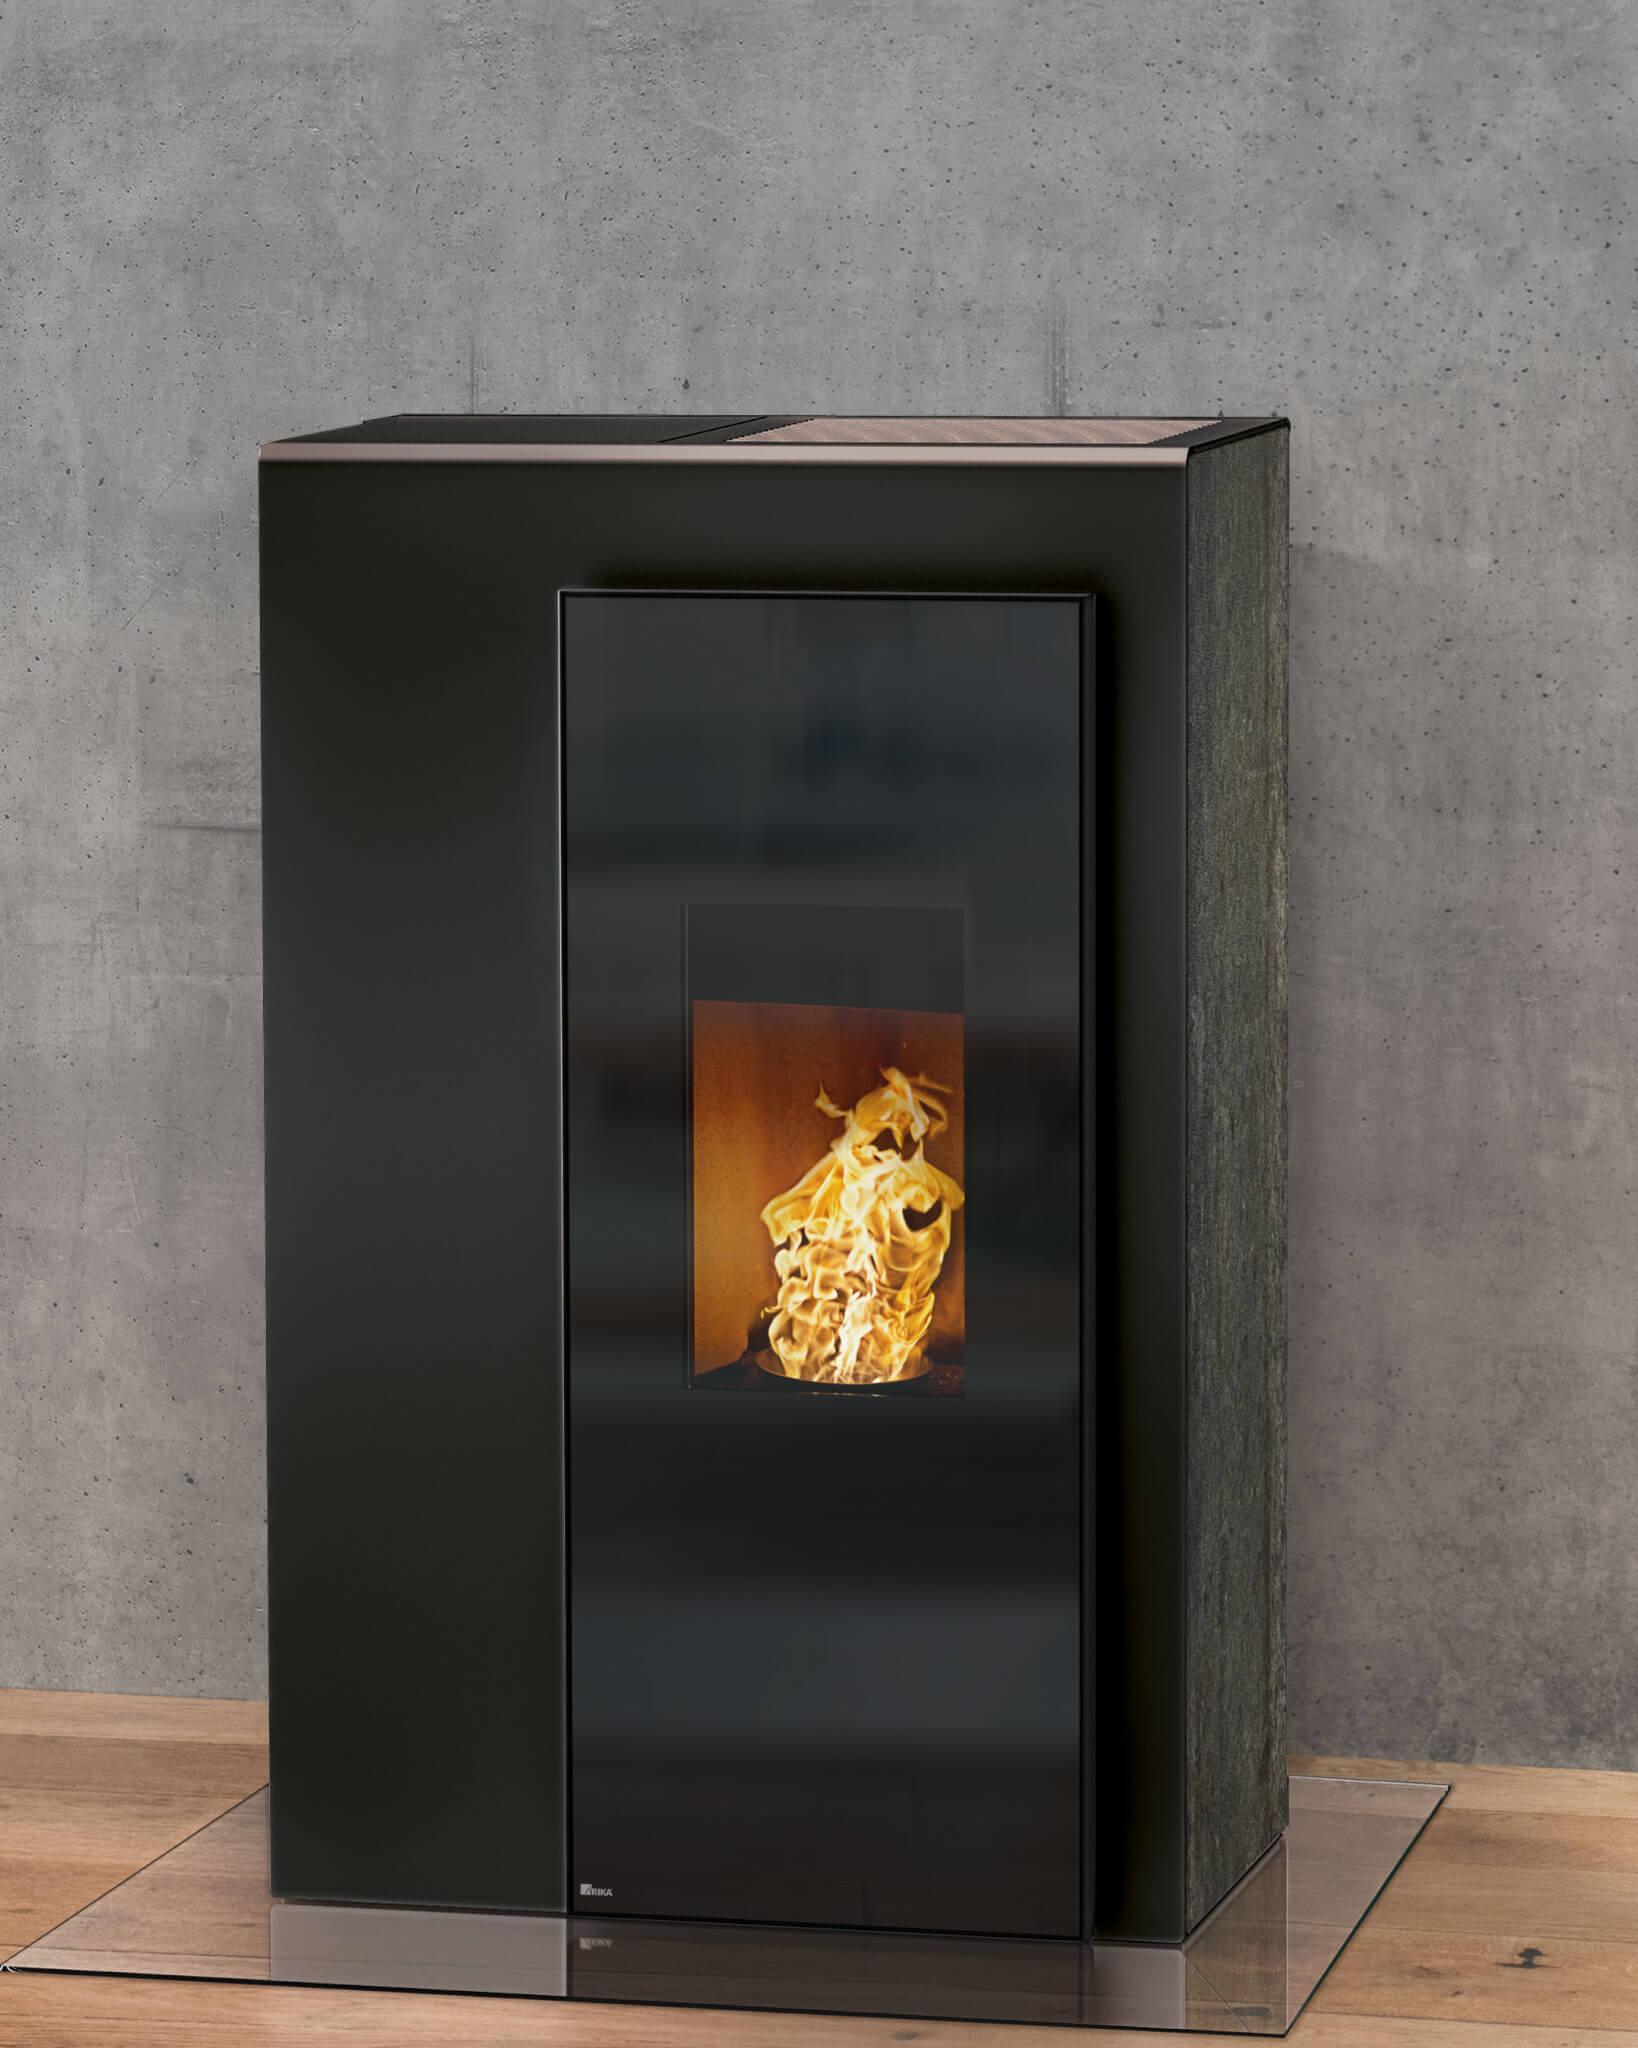 miro 6 kw stera. Black Bedroom Furniture Sets. Home Design Ideas